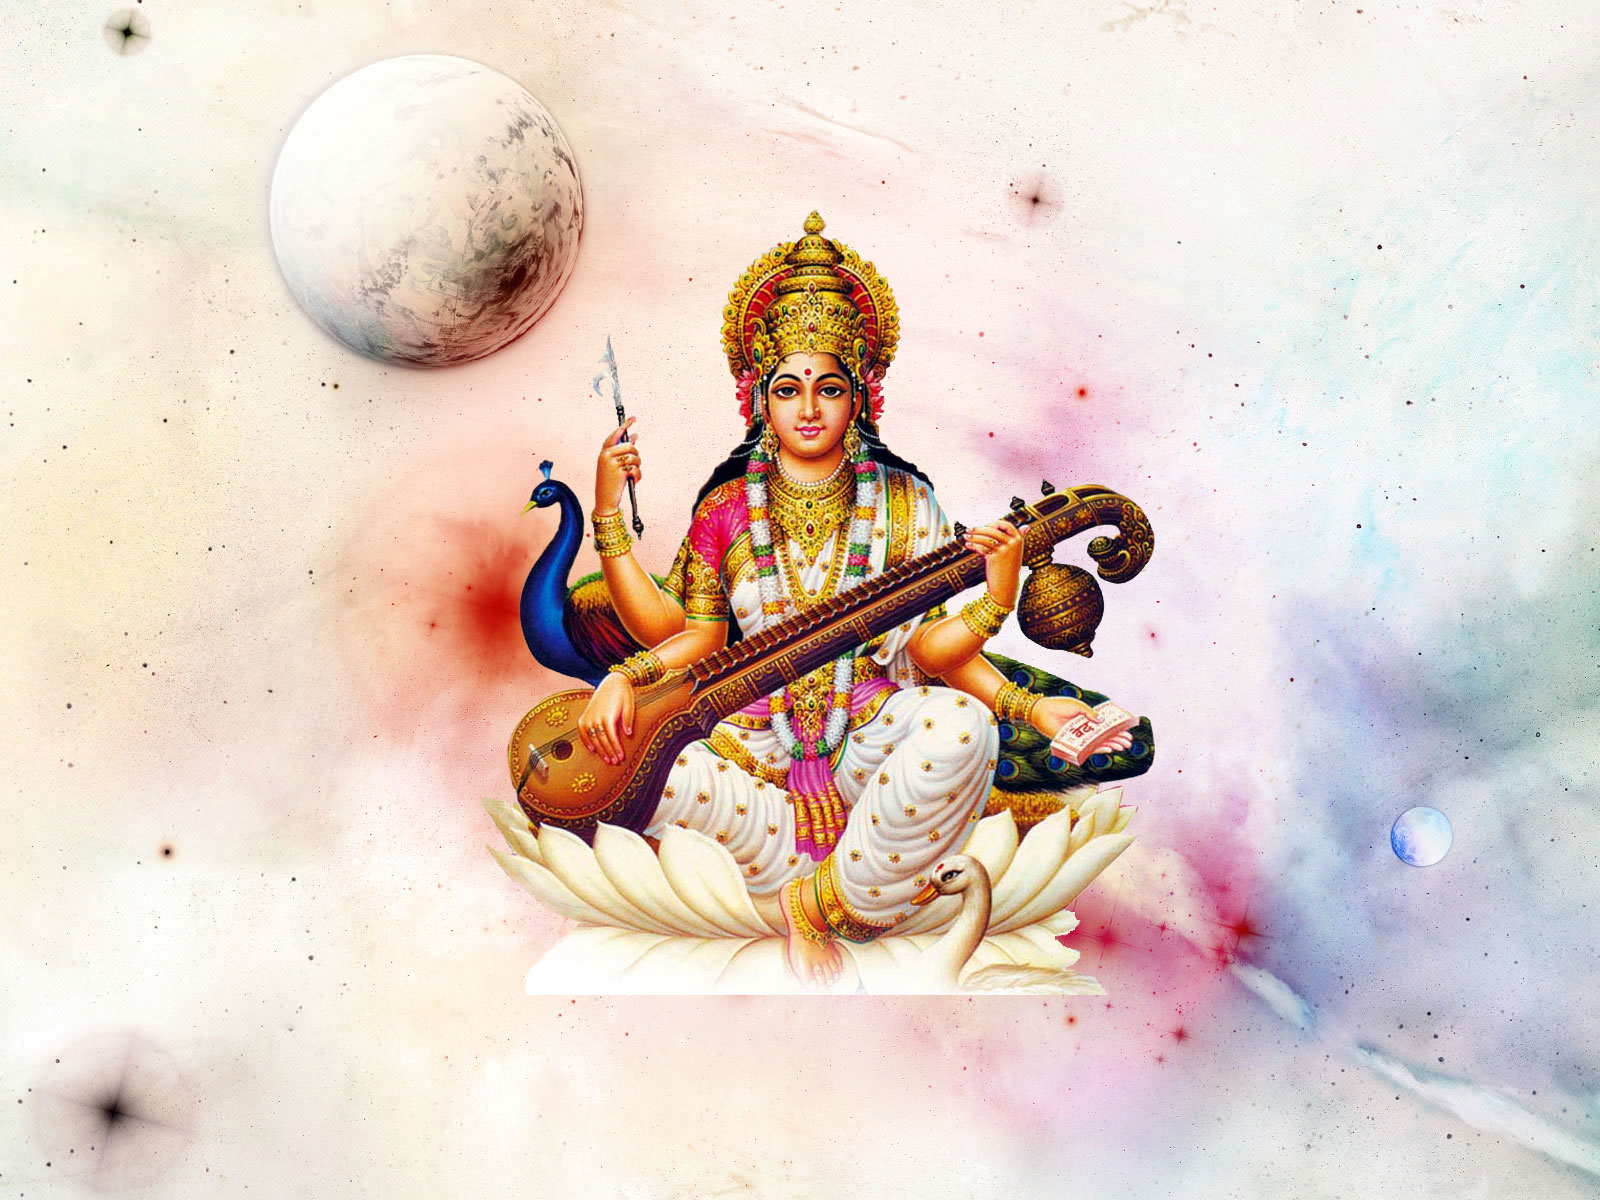 Saraswati god pictures